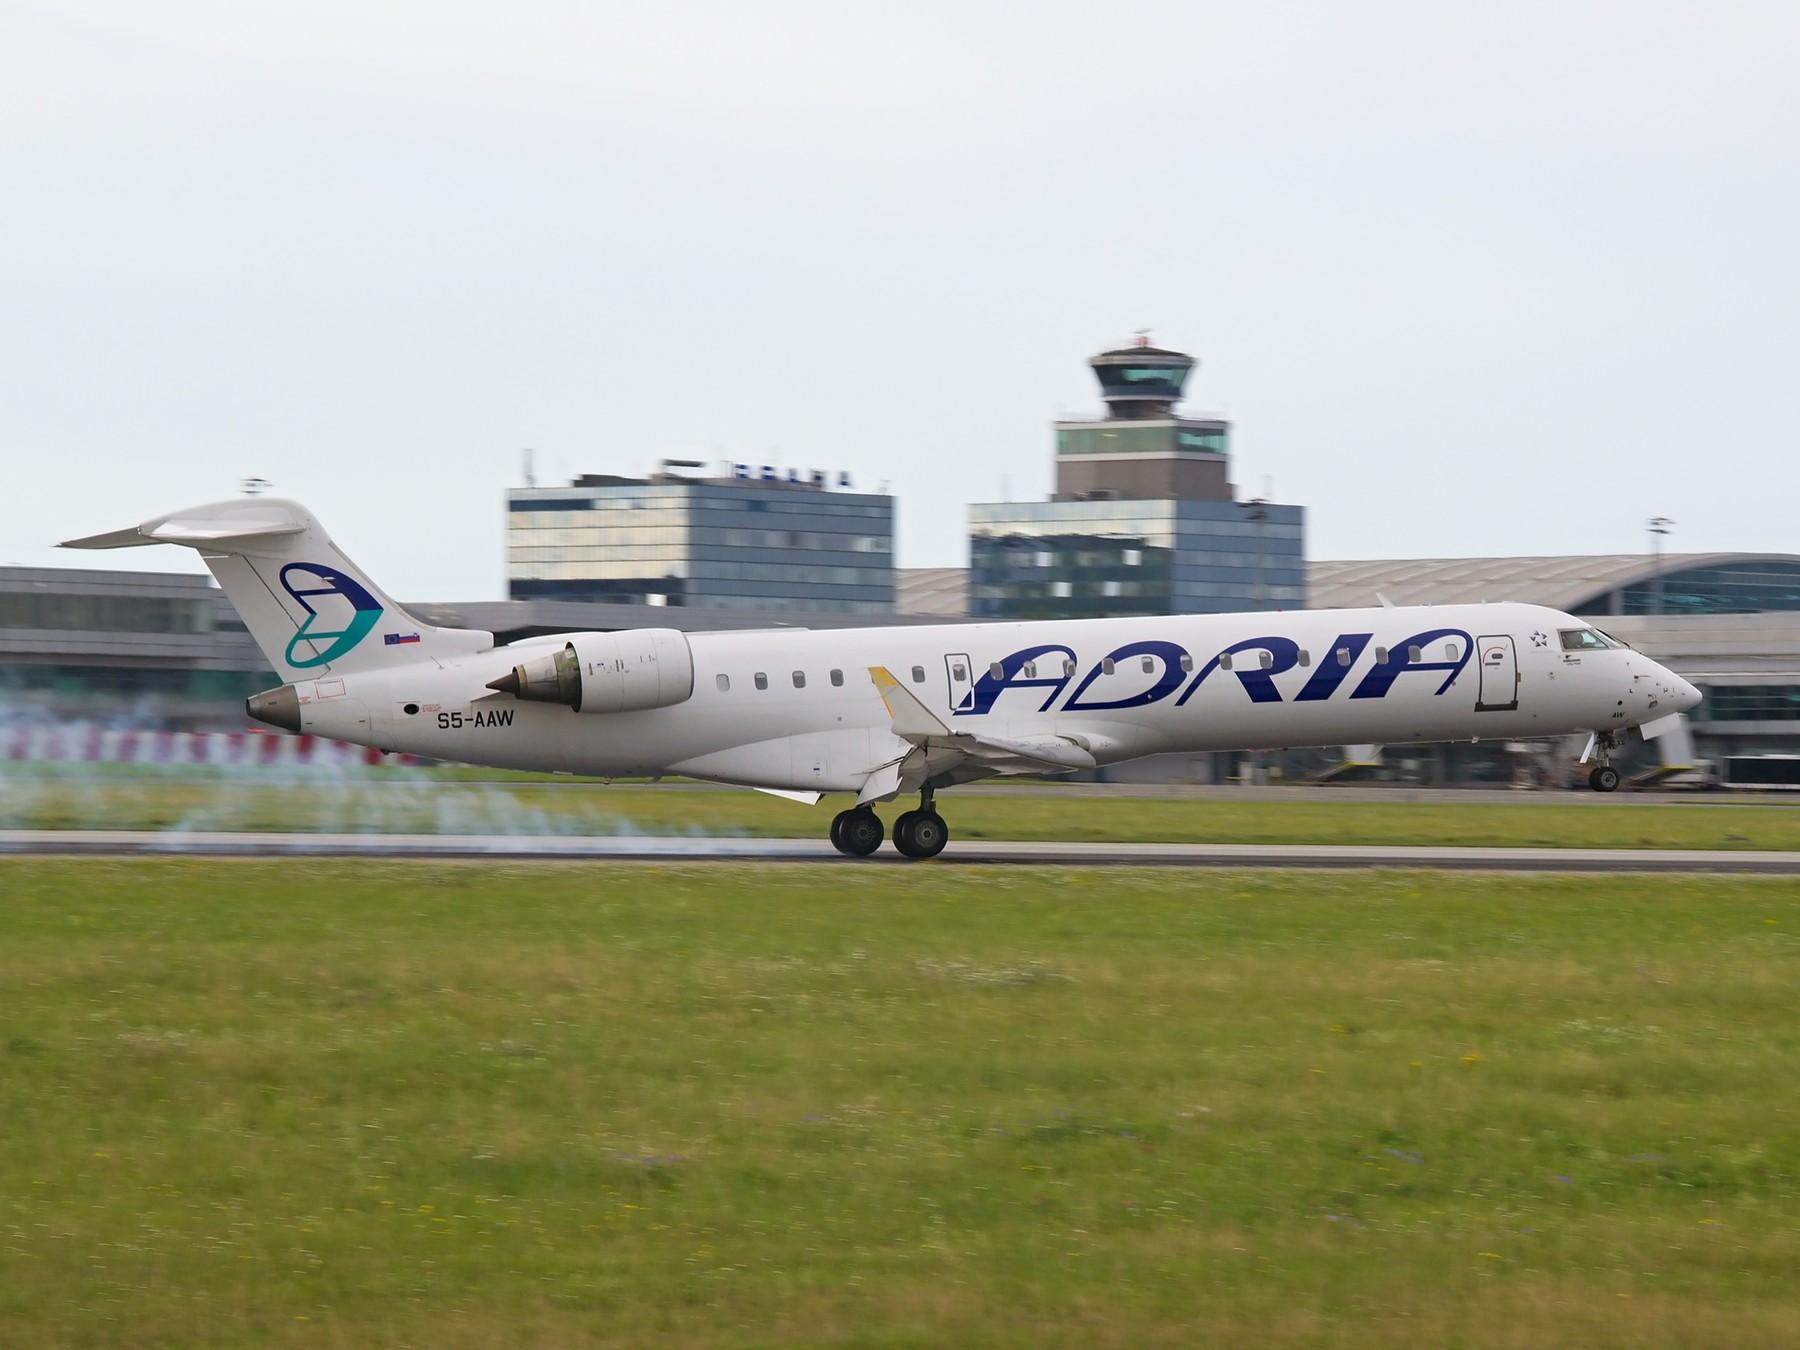 Avion Adria Airwaysa